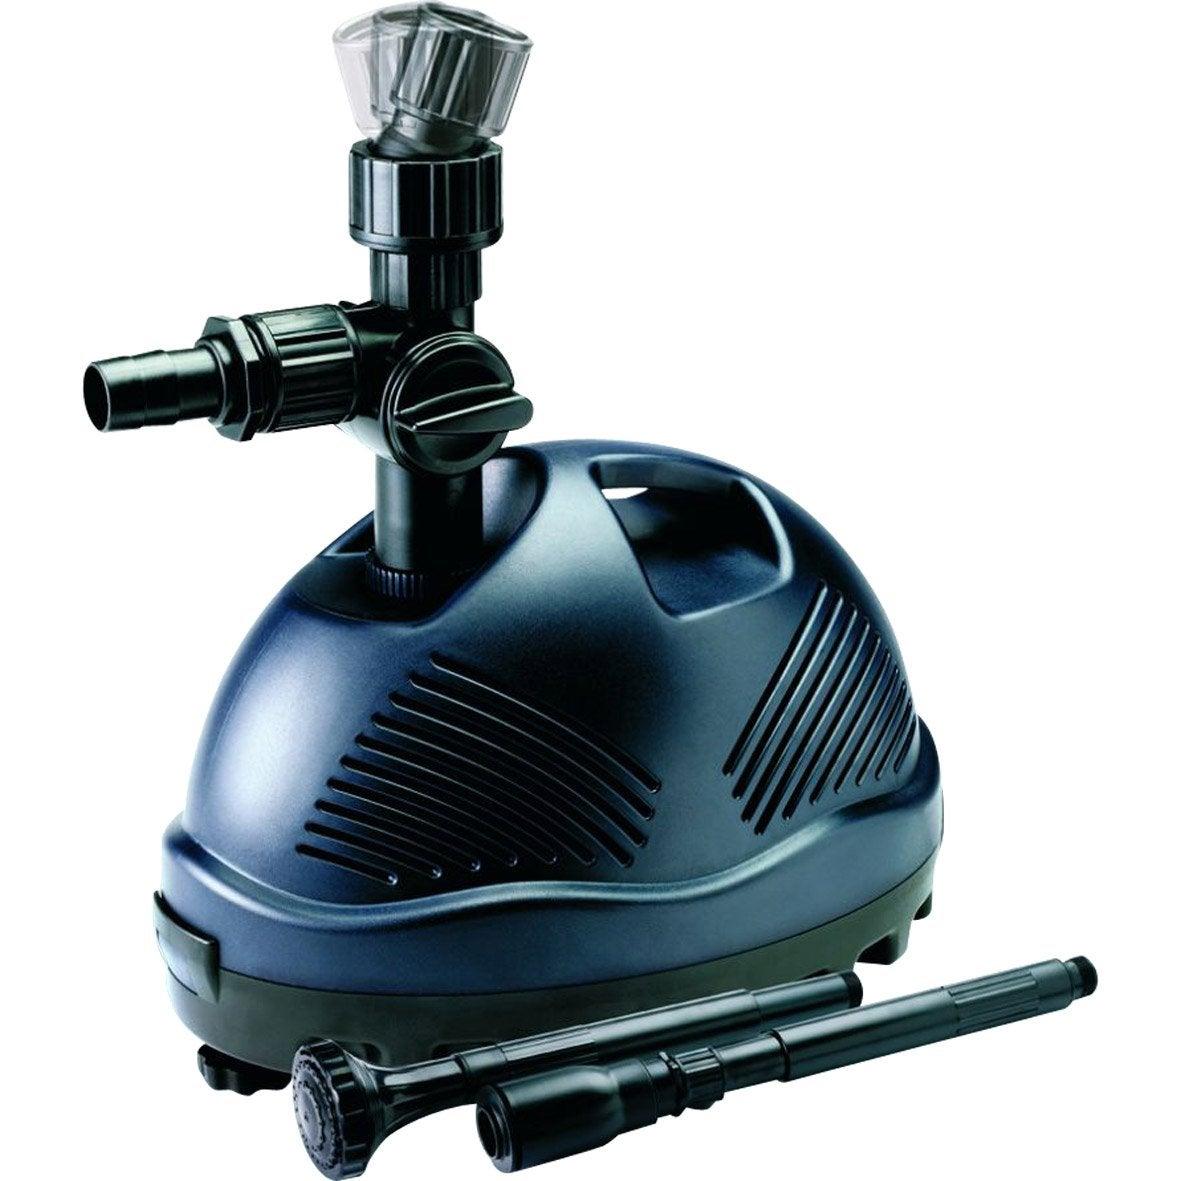 Pompe de bassin ubbink elimax 3000 l leroy merlin - Prix pompe de relevage leroy merlin ...